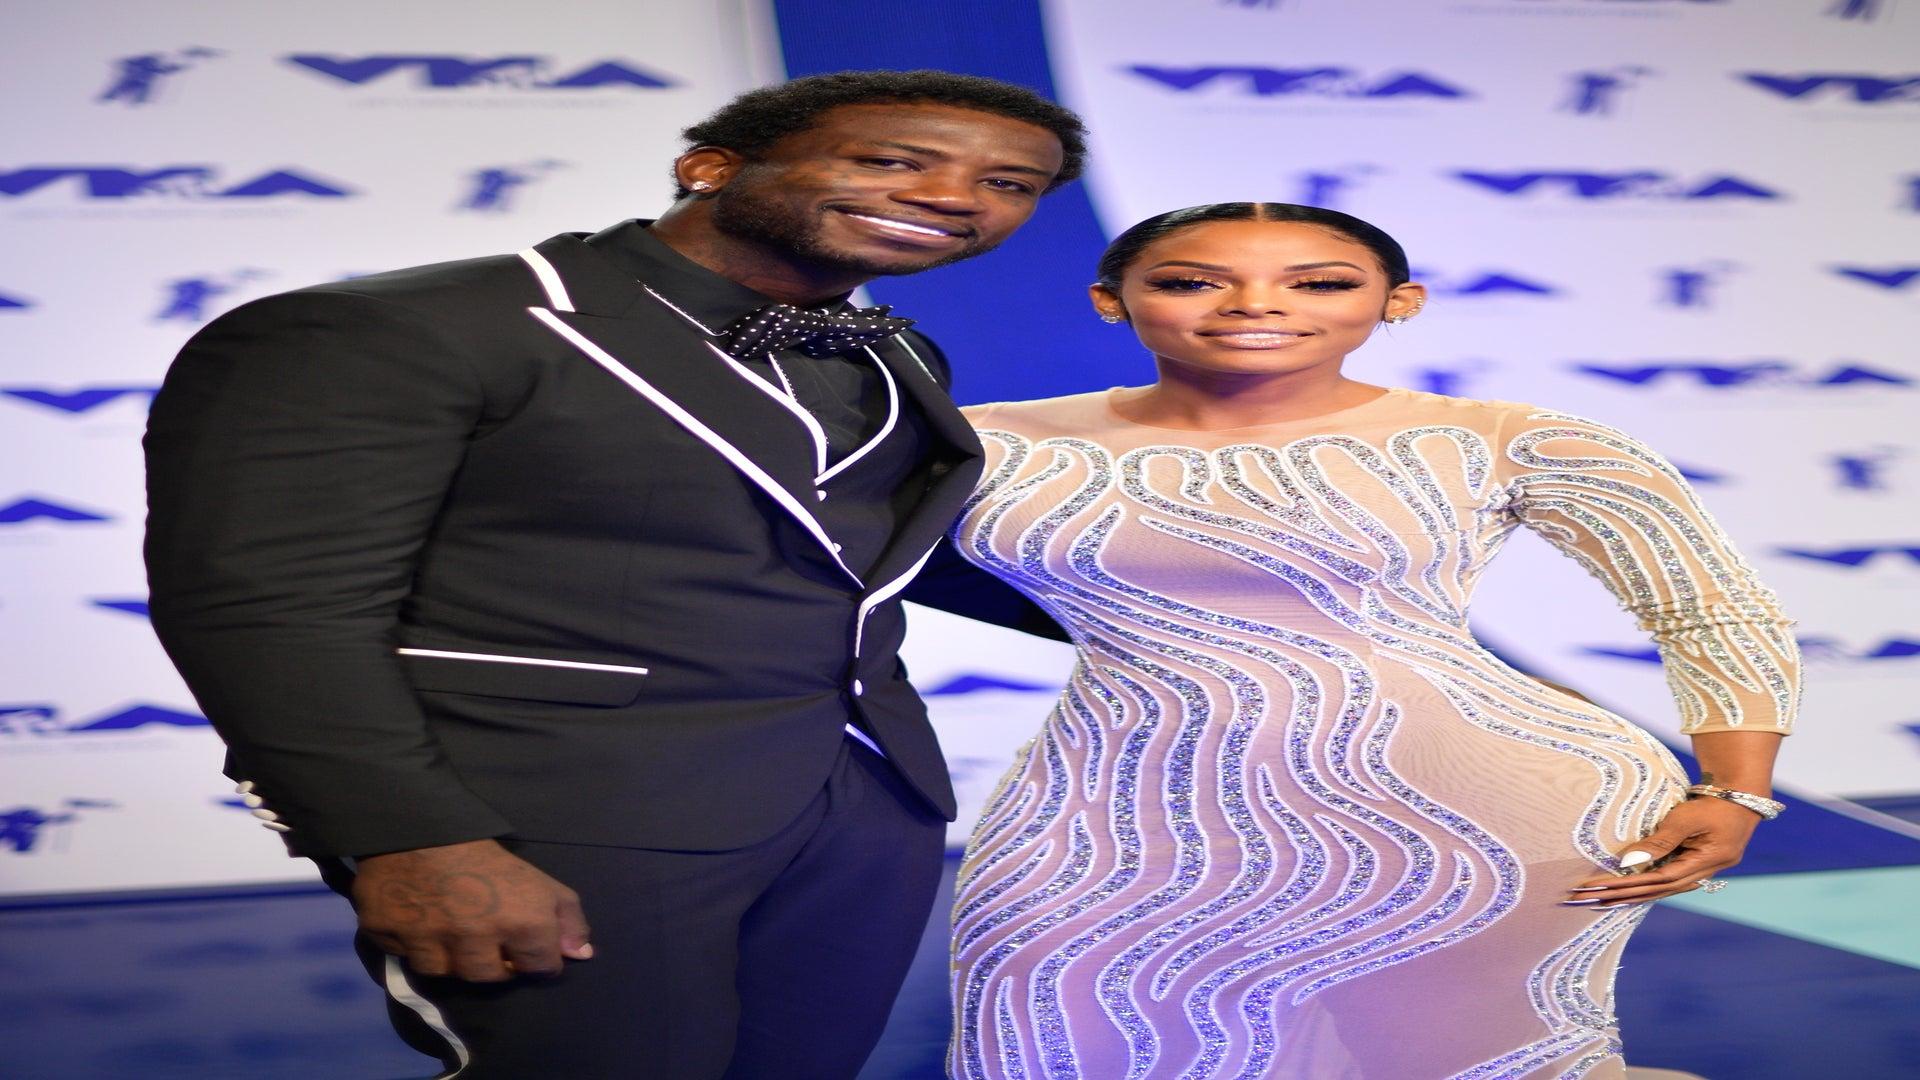 Gucci Mane and Fiancé Keyshia Ka'oir Sent Out the Most Lavish Wedding InvitationsEver!